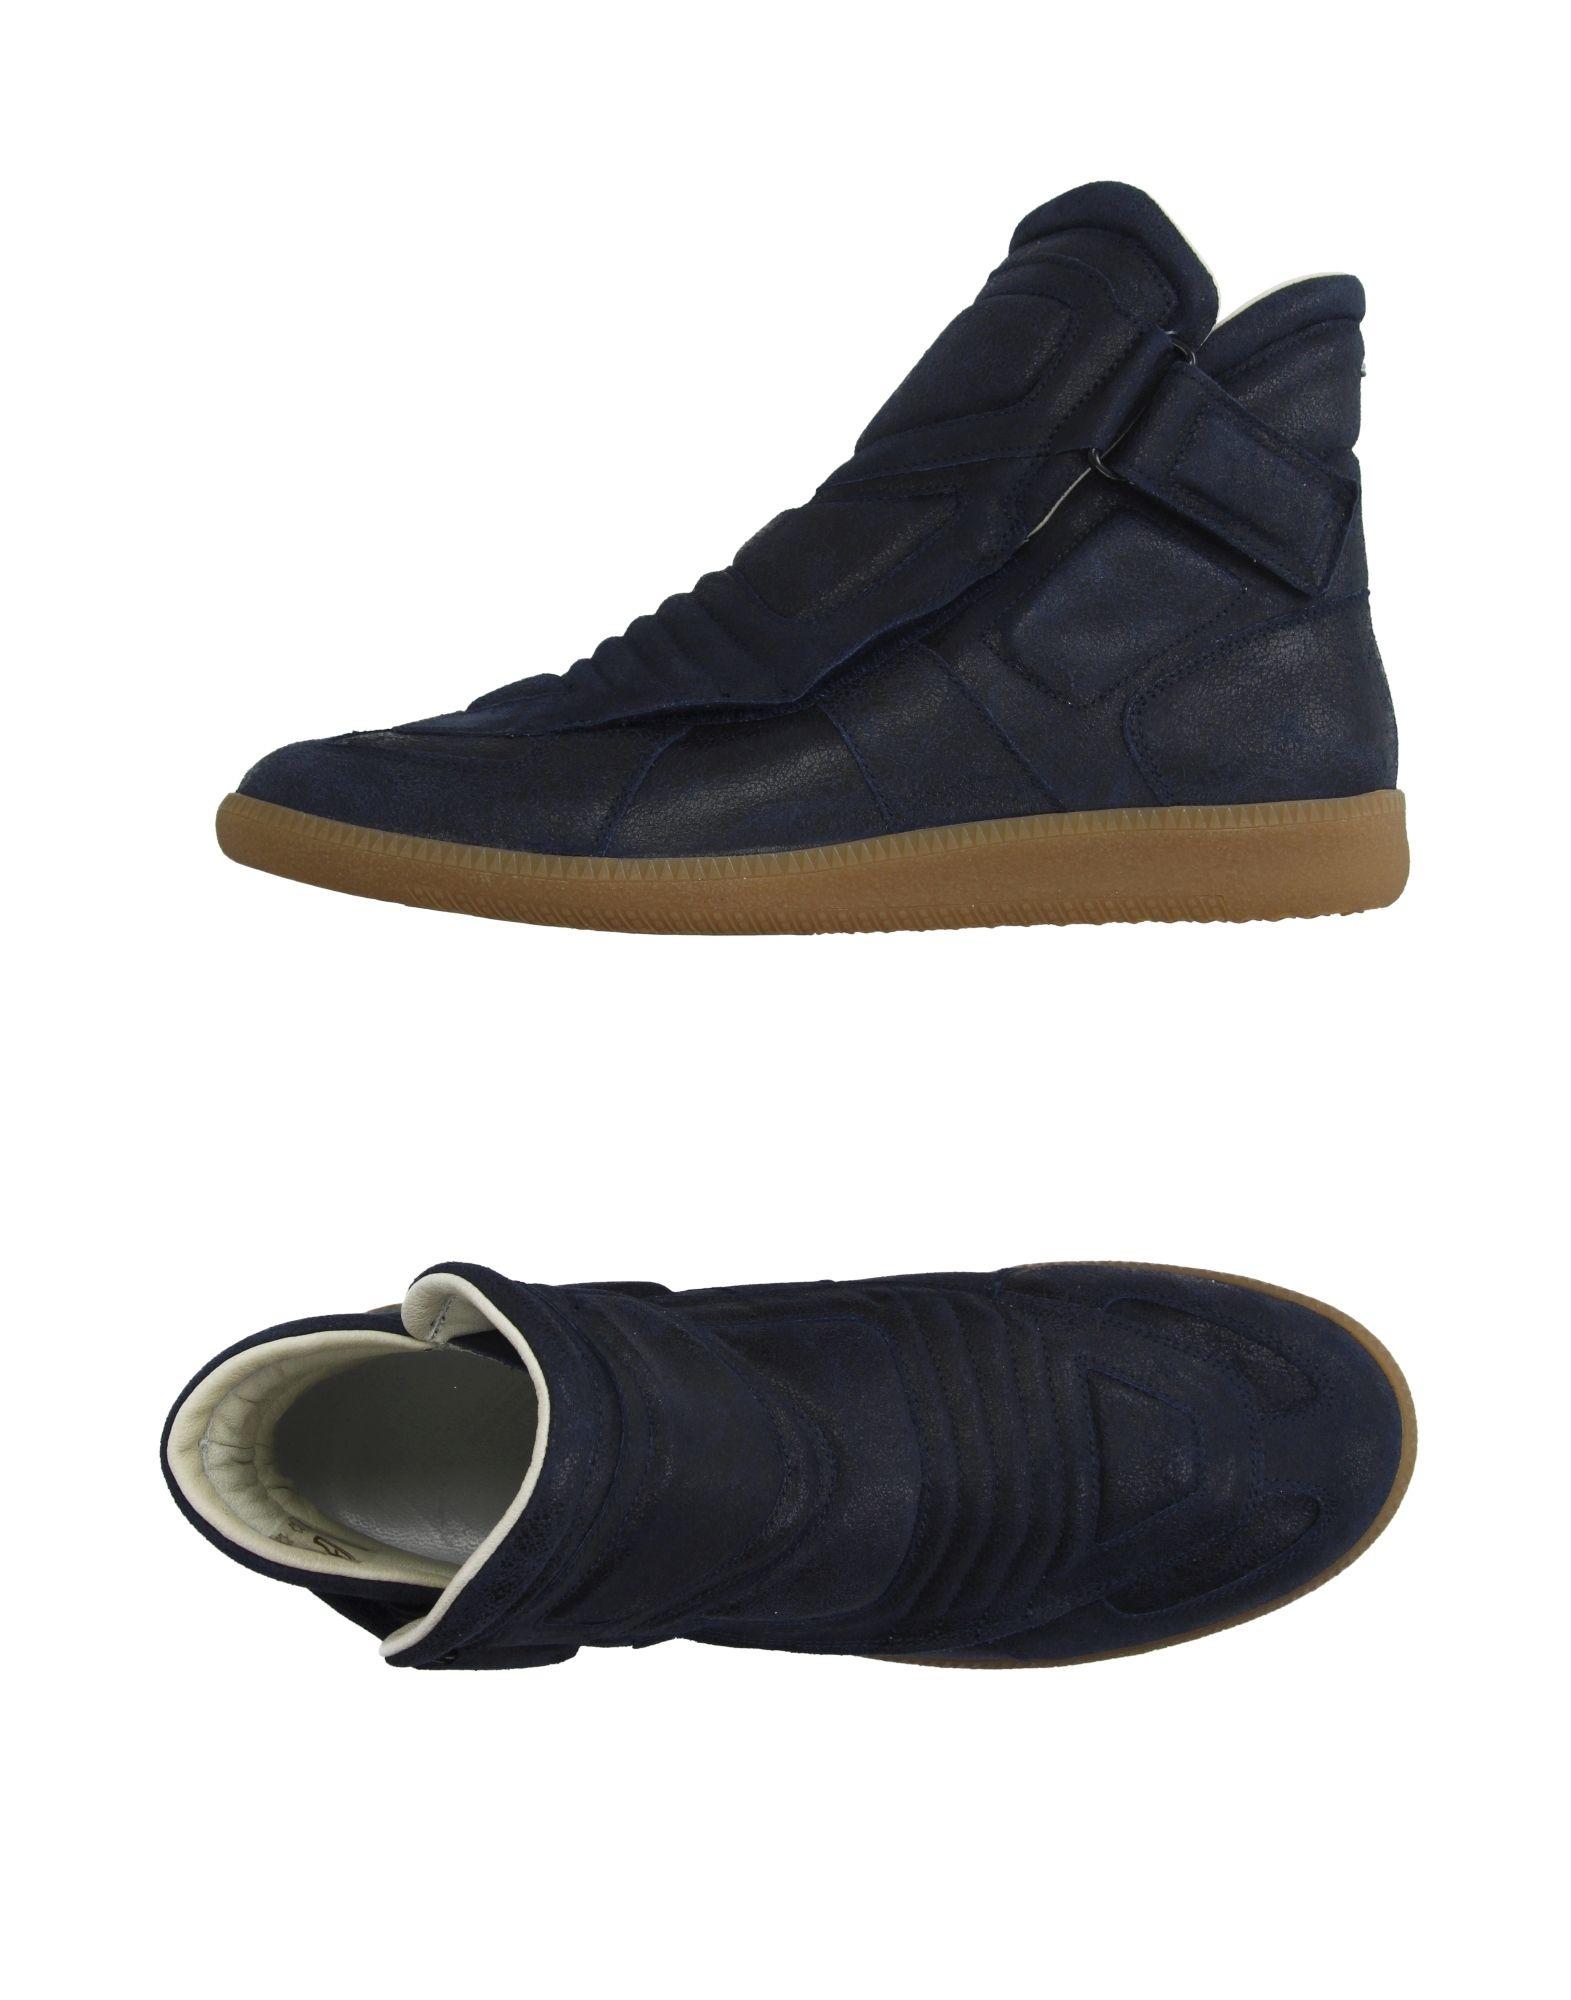 maison margiela high tops sneakers in blue for men lyst. Black Bedroom Furniture Sets. Home Design Ideas